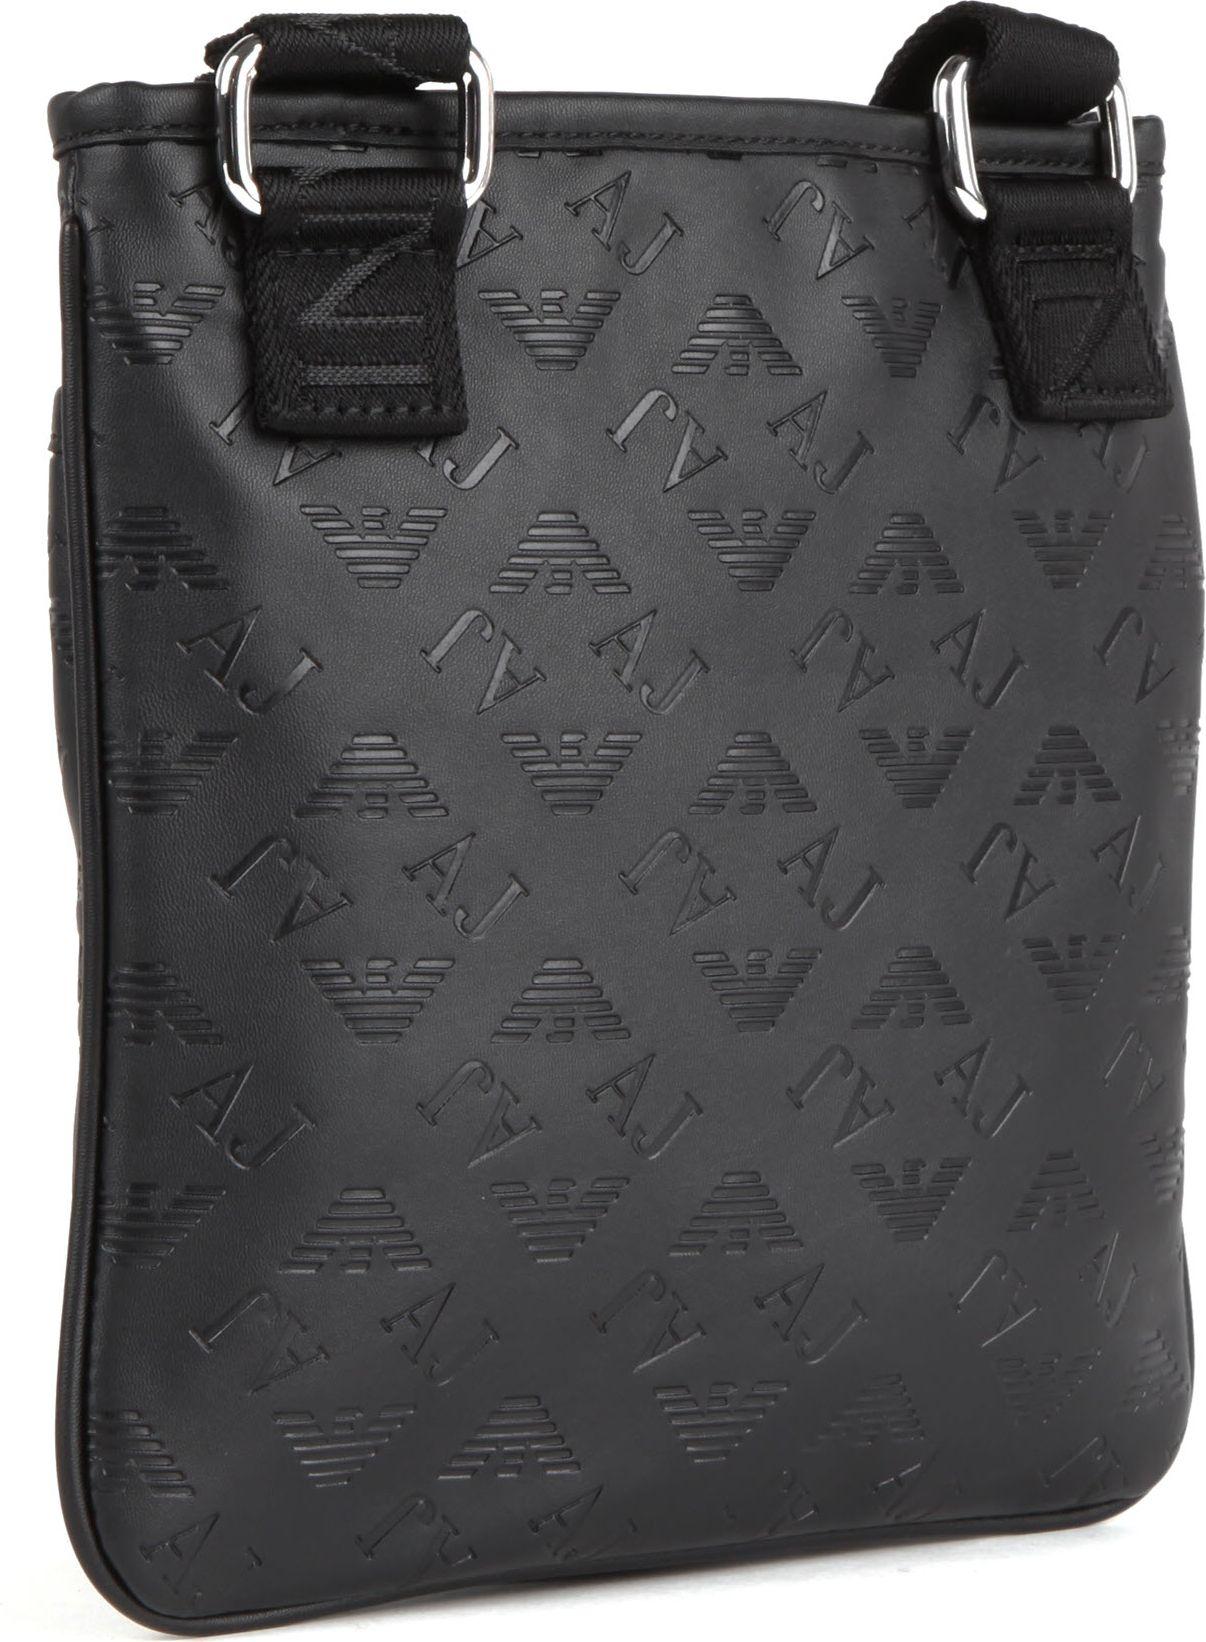 Armani Jeans Fauxleather Messenger Bag in Black for Men - Lyst 02a4835059